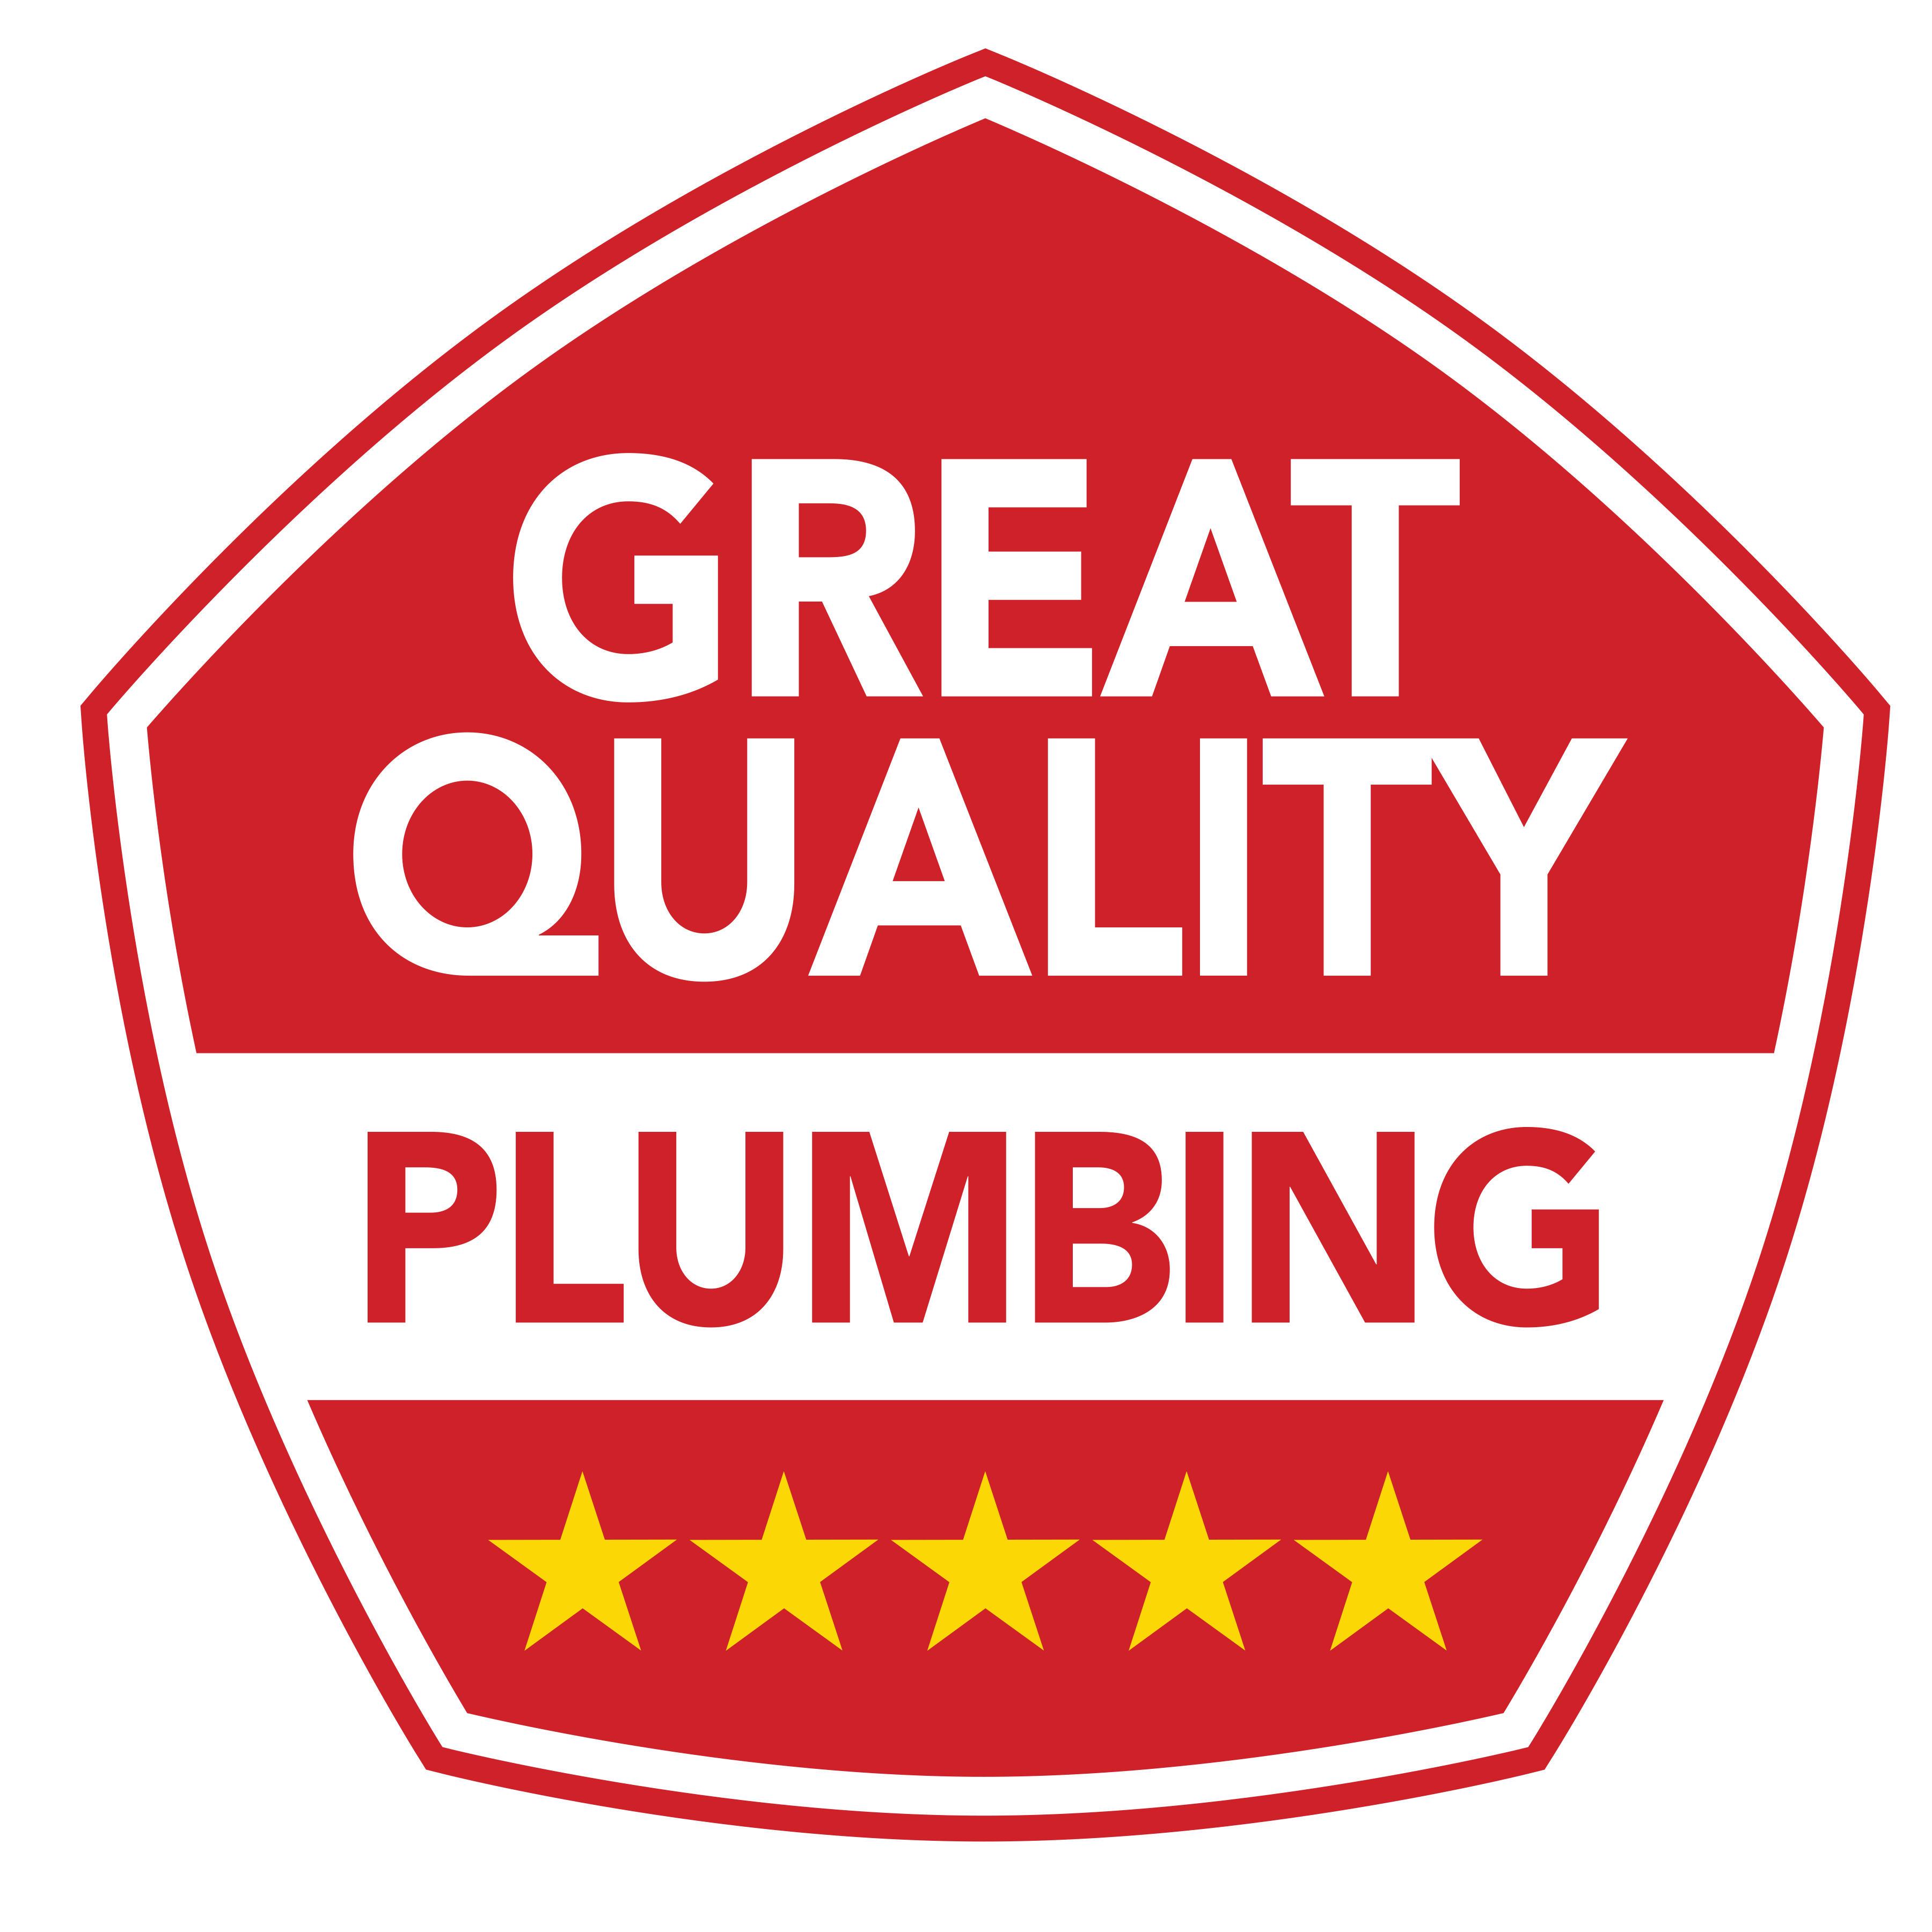 Great Quality Plumbing